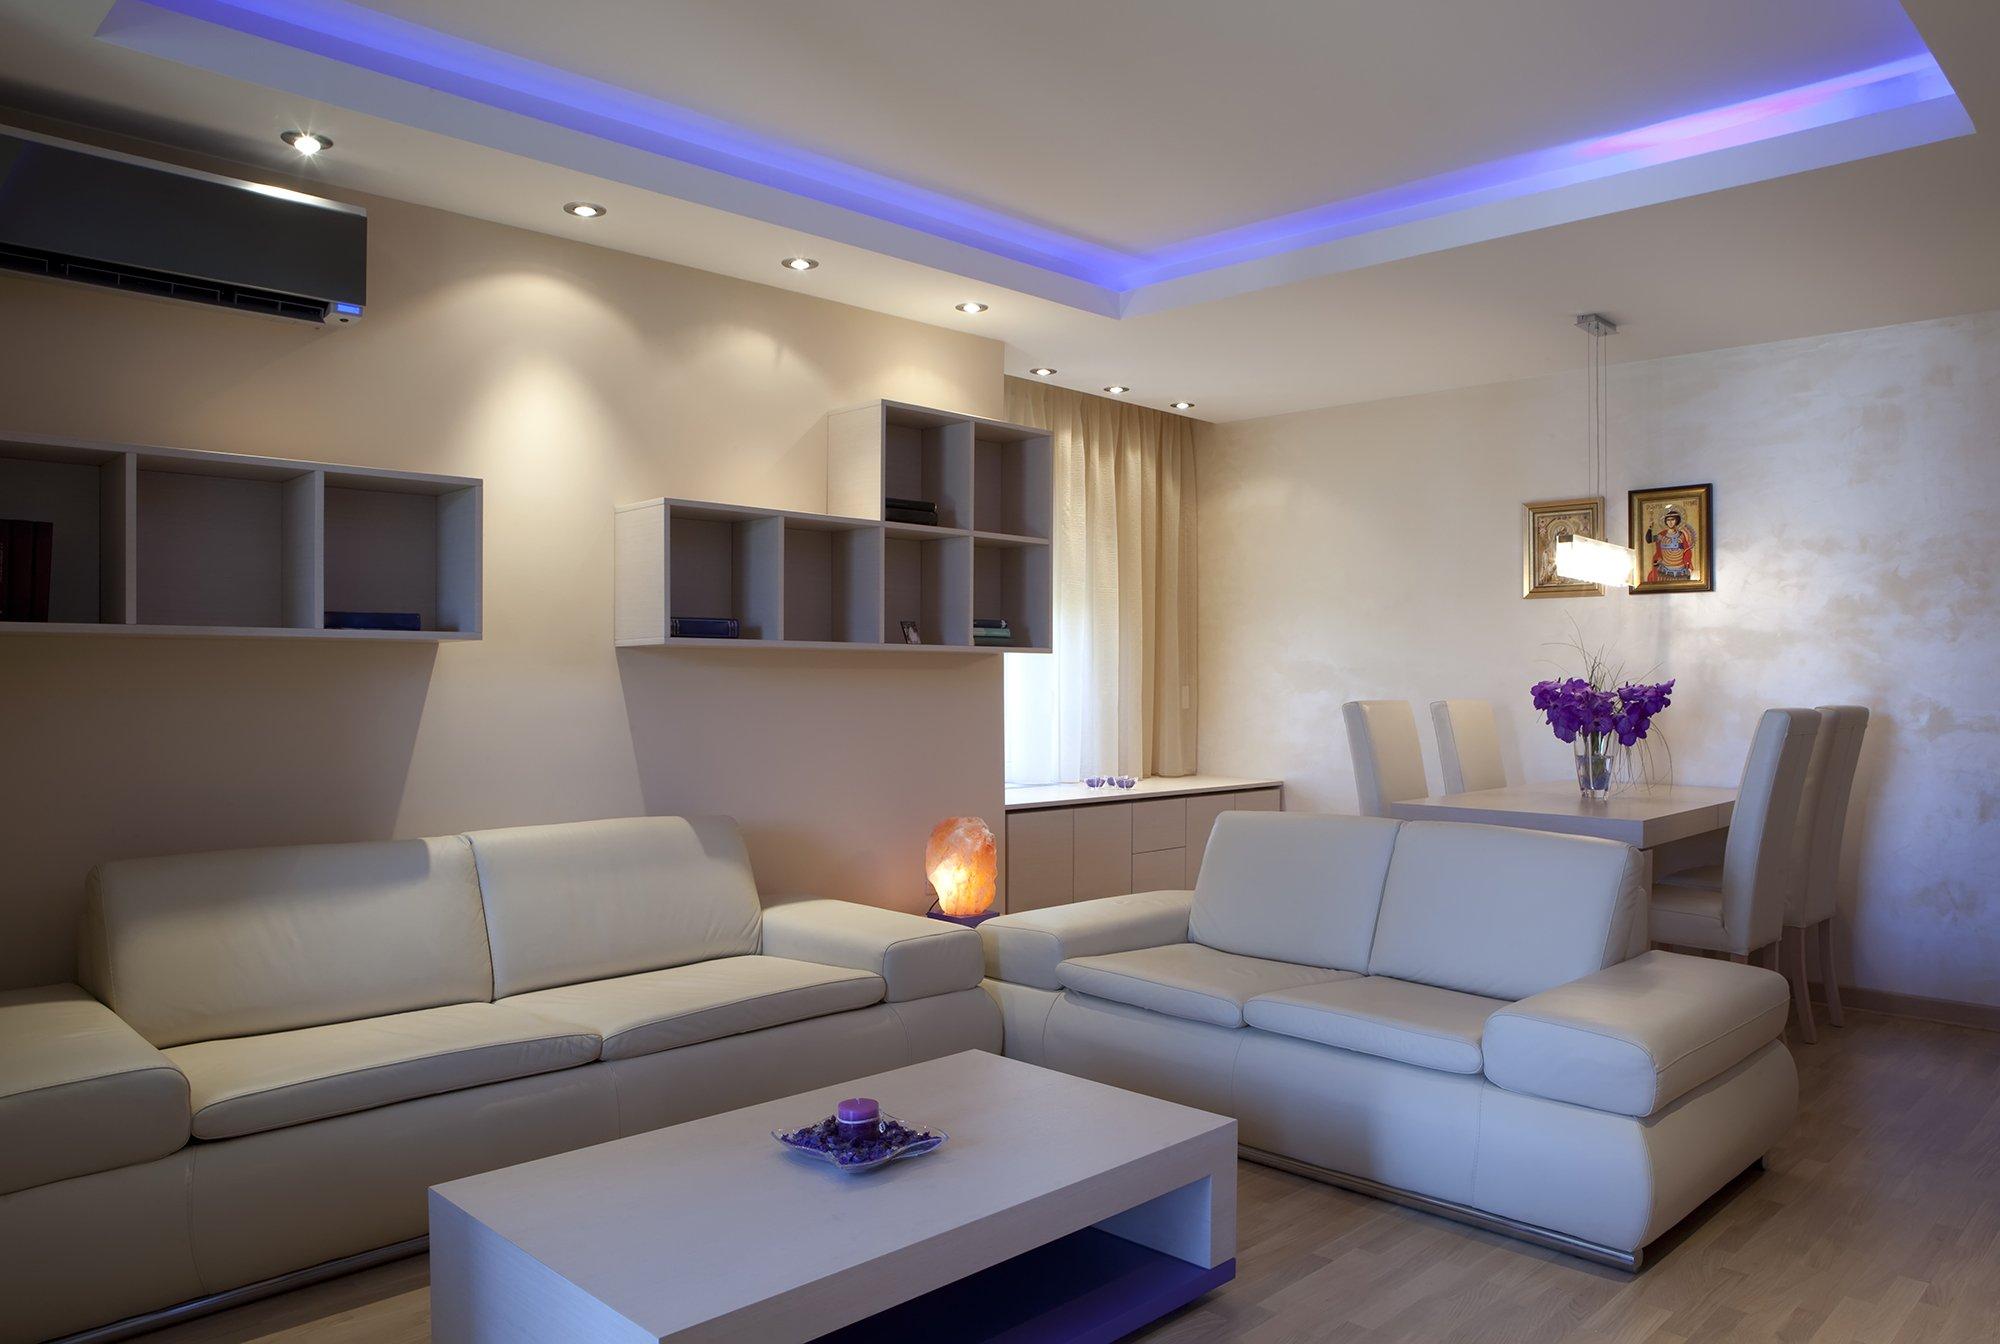 Smart Lighting Installations in Gerrards Cross & London